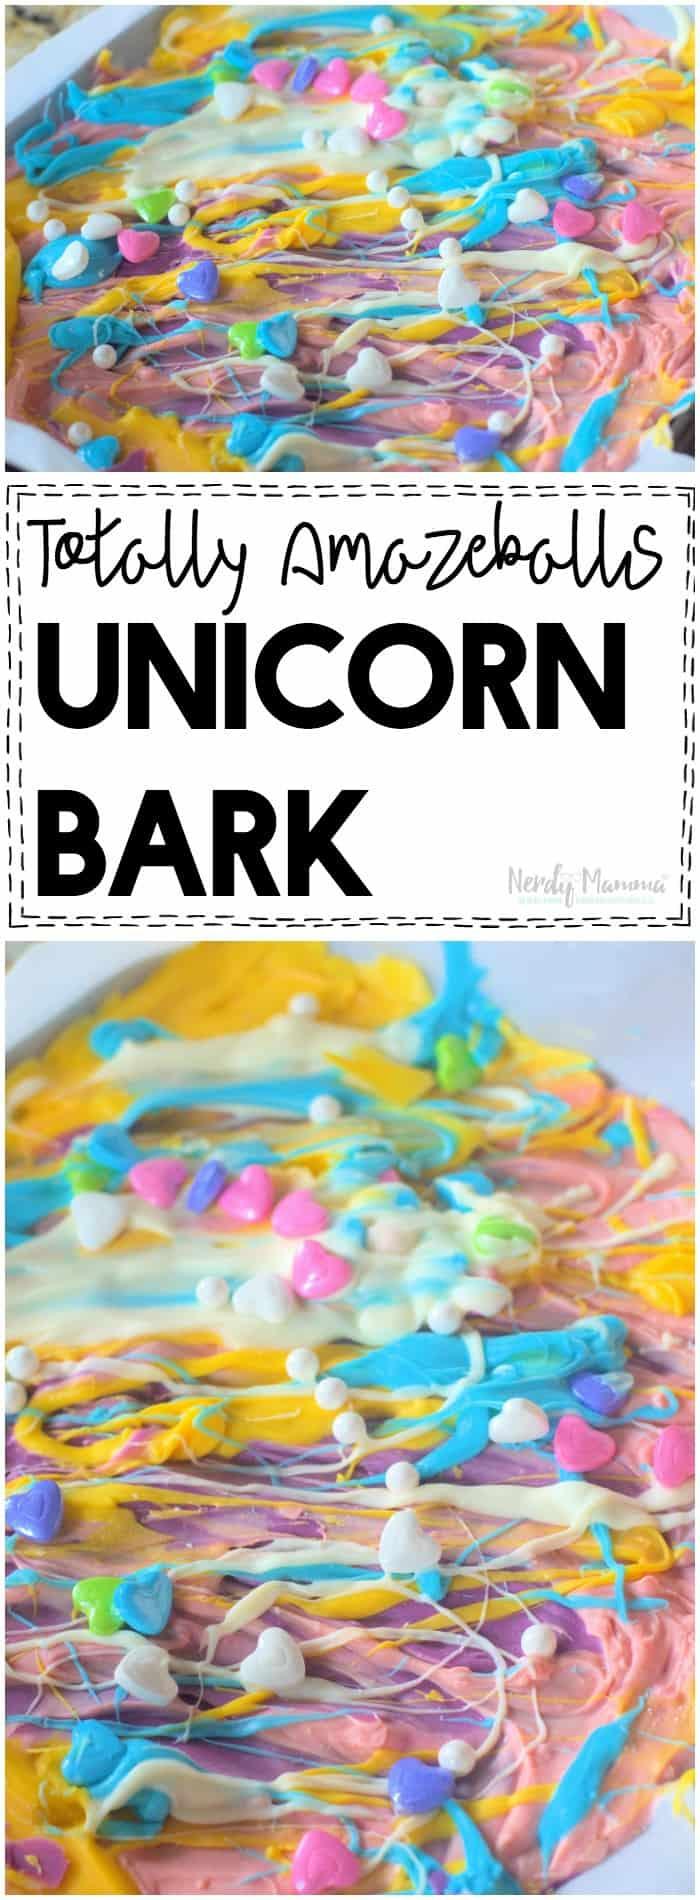 OMG, You MUST try this totally amazeballs unicorn bark!